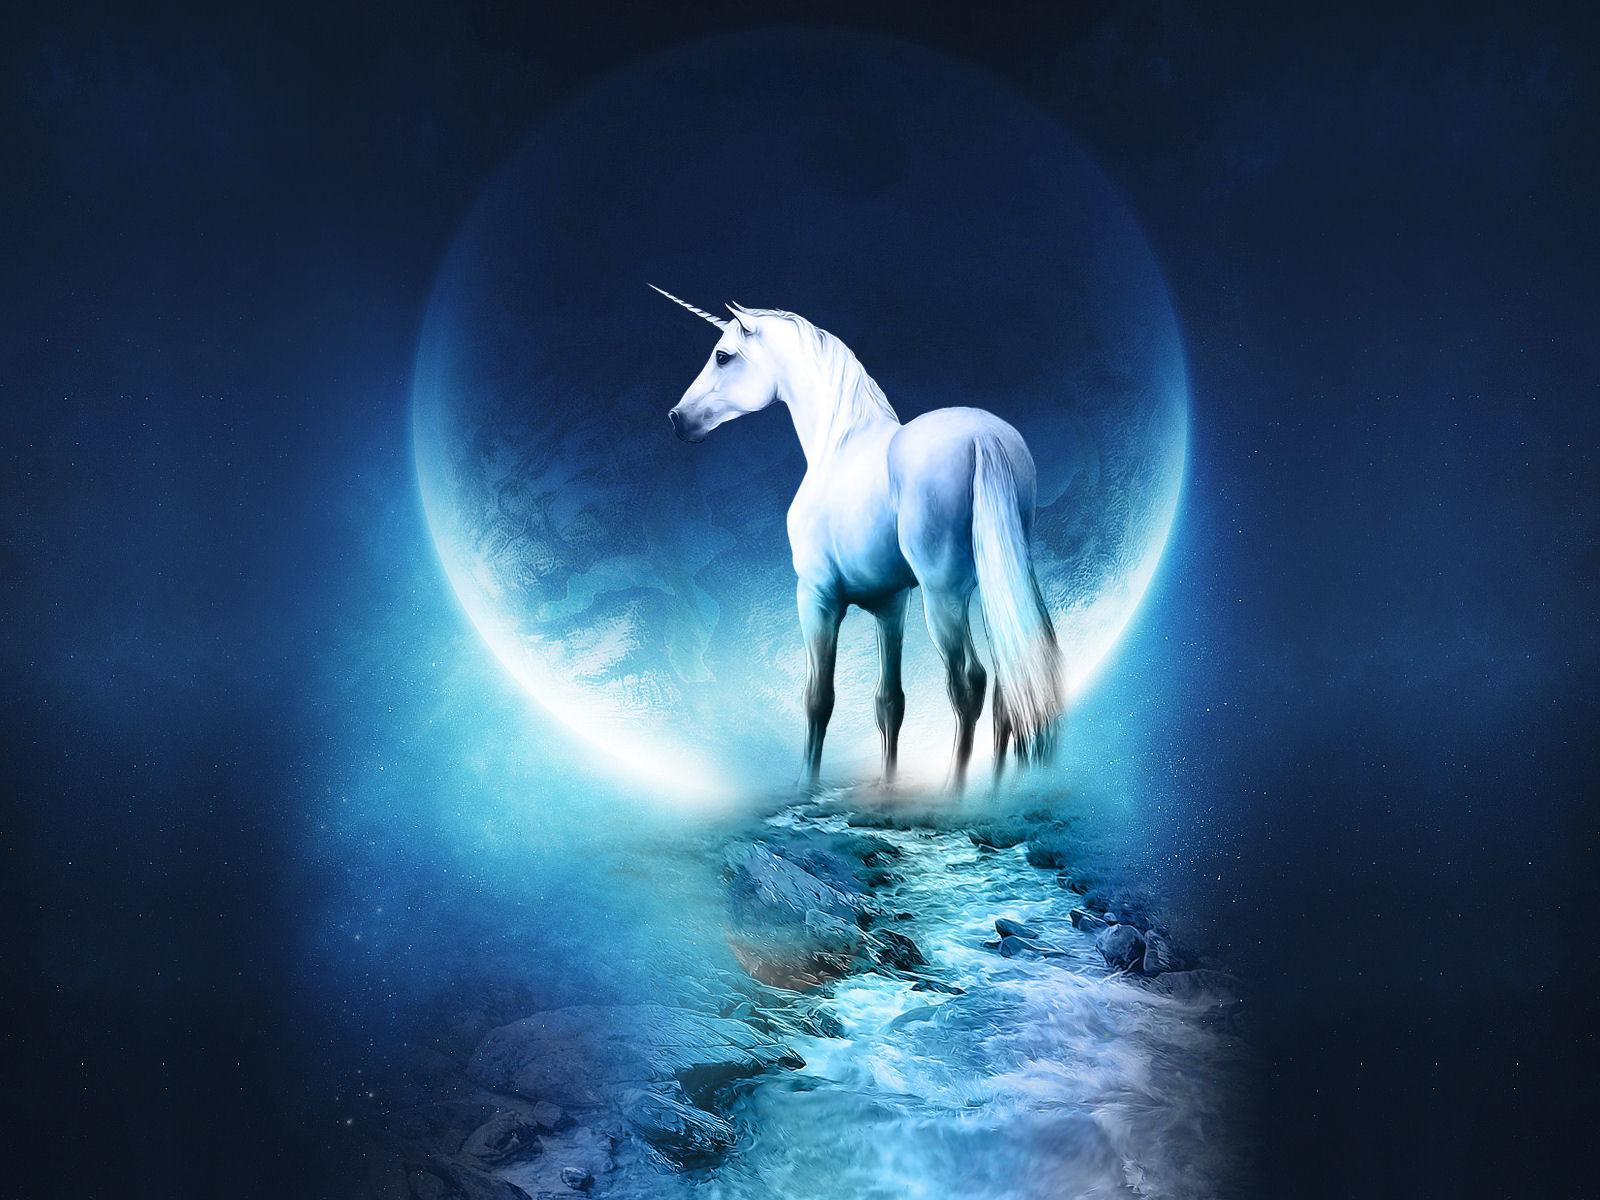 Unicorn wallpapers HD quality